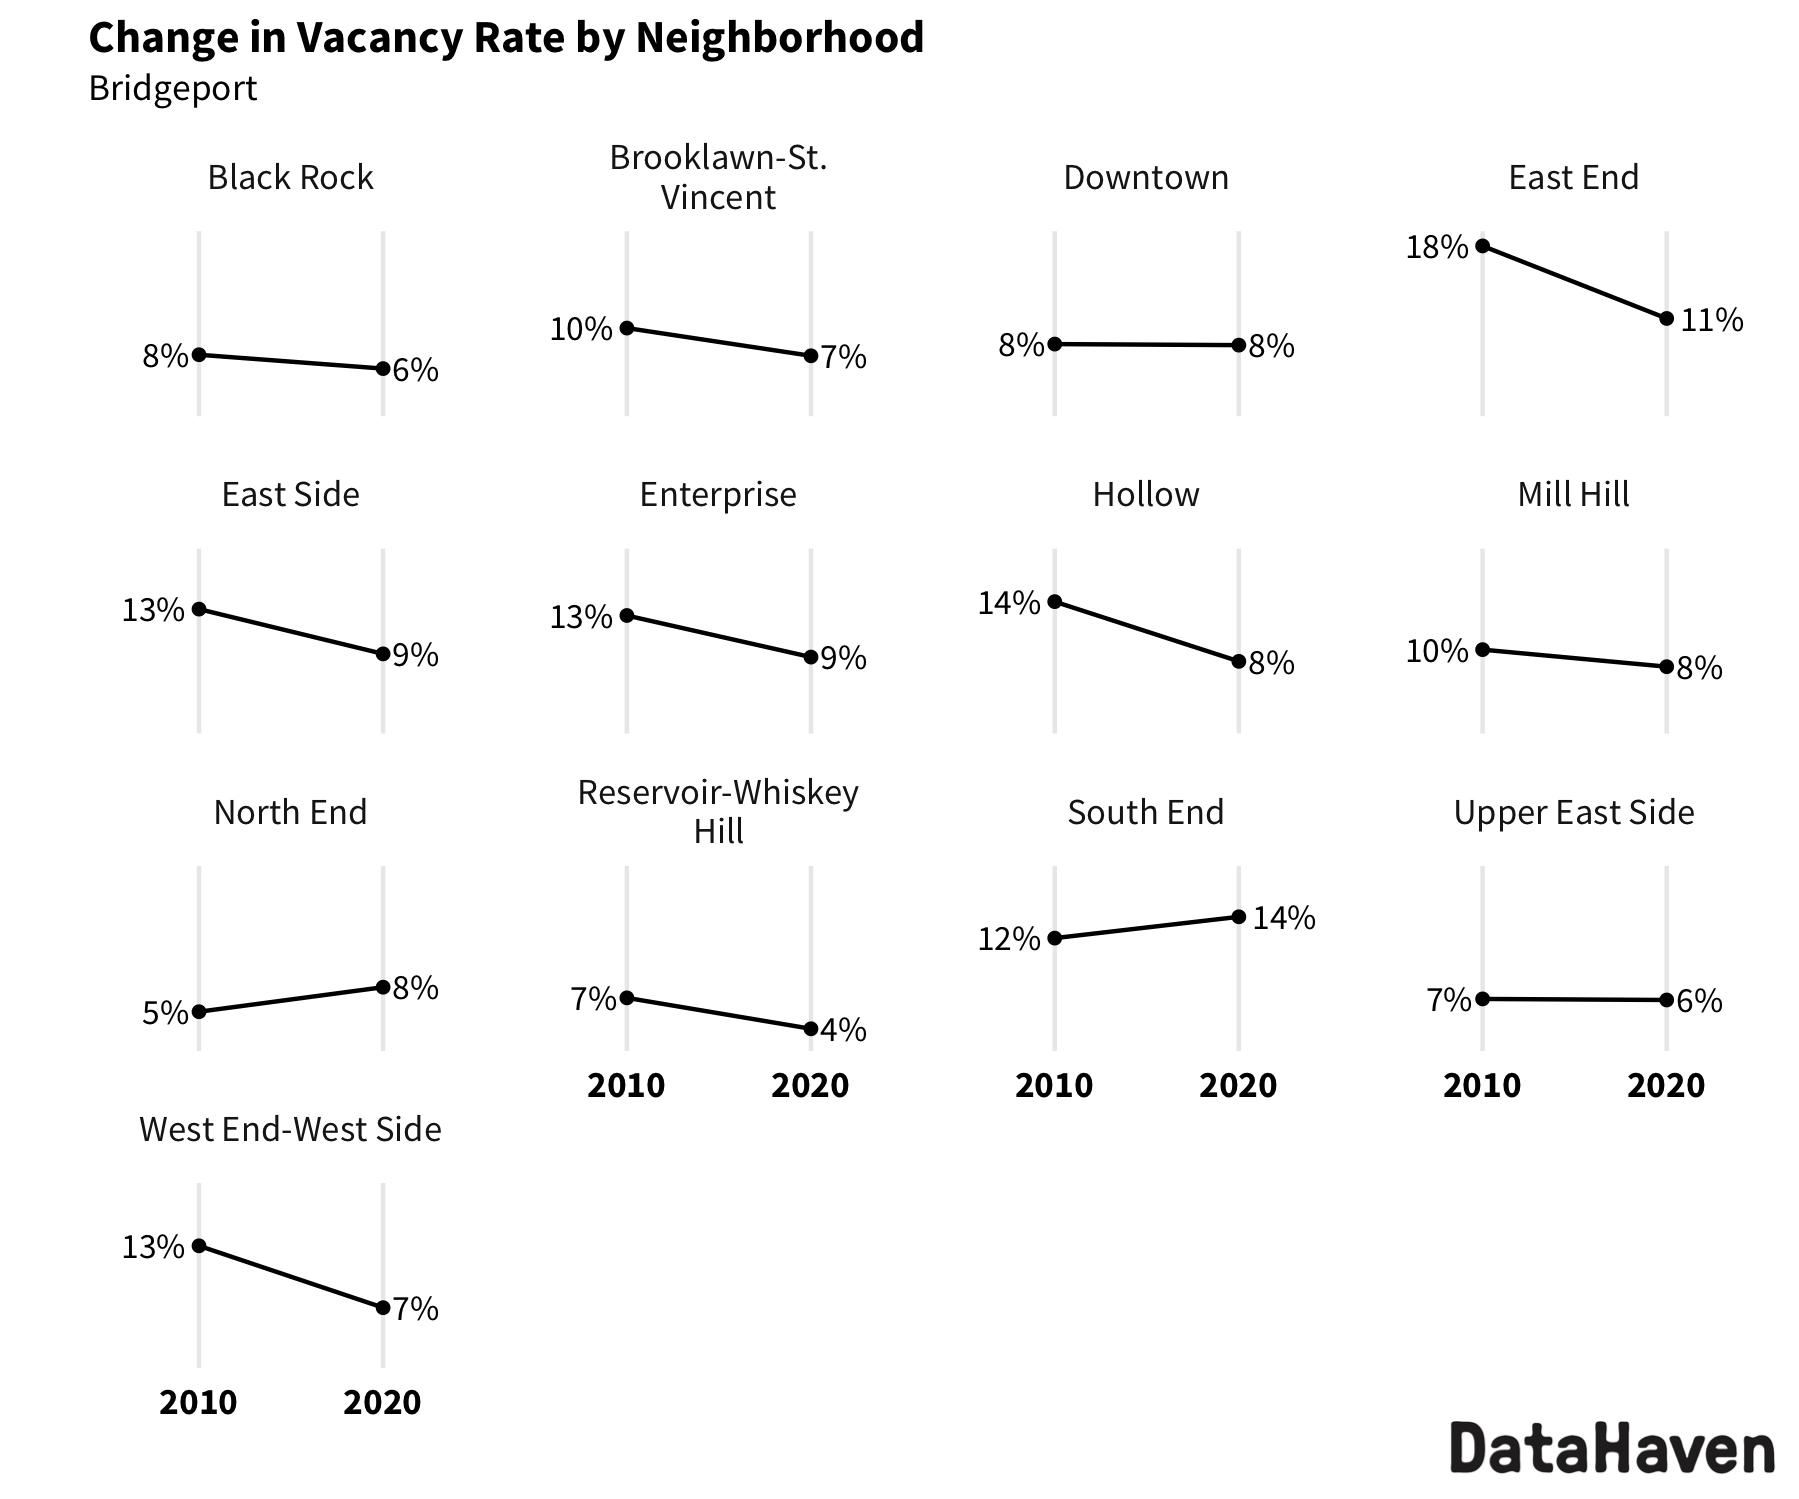 Bridgeport change in vacancy rate from 2010 to 2020 Census by neighborhood